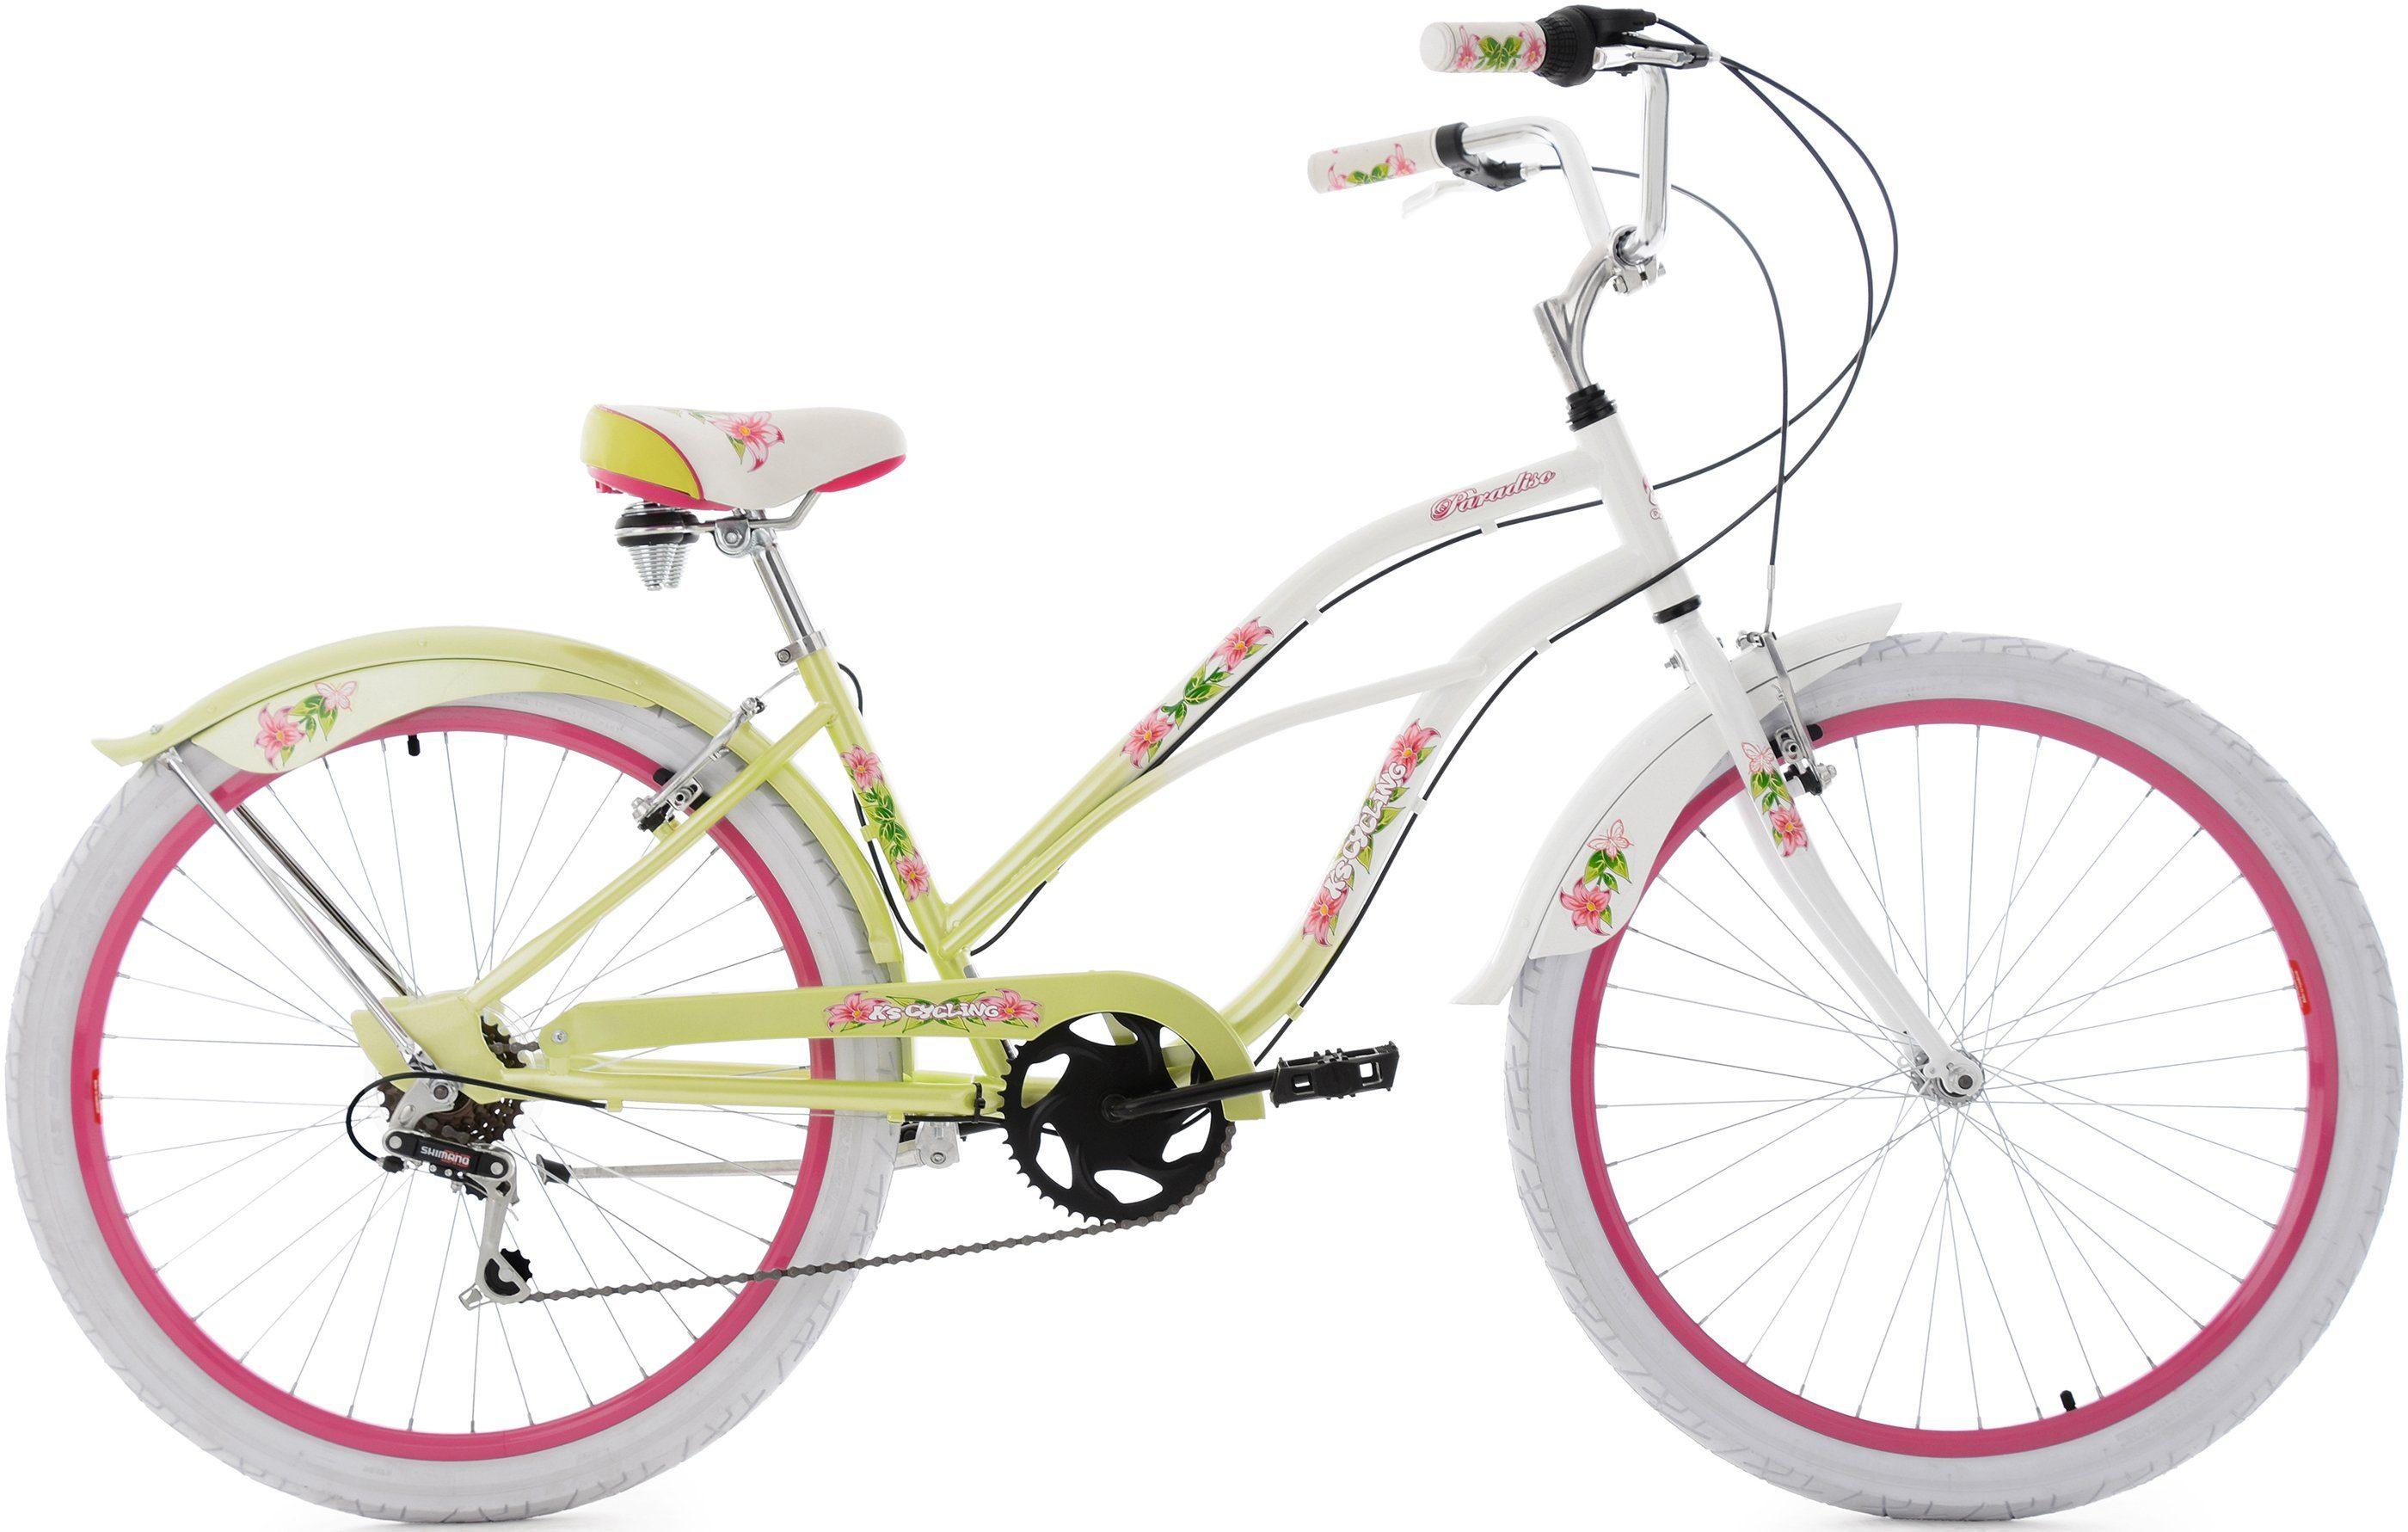 KS Cycling Beachcruiser, 26 Zoll, 6 Gang Shimano Kettenschaltung, Damen, »Paradiso«